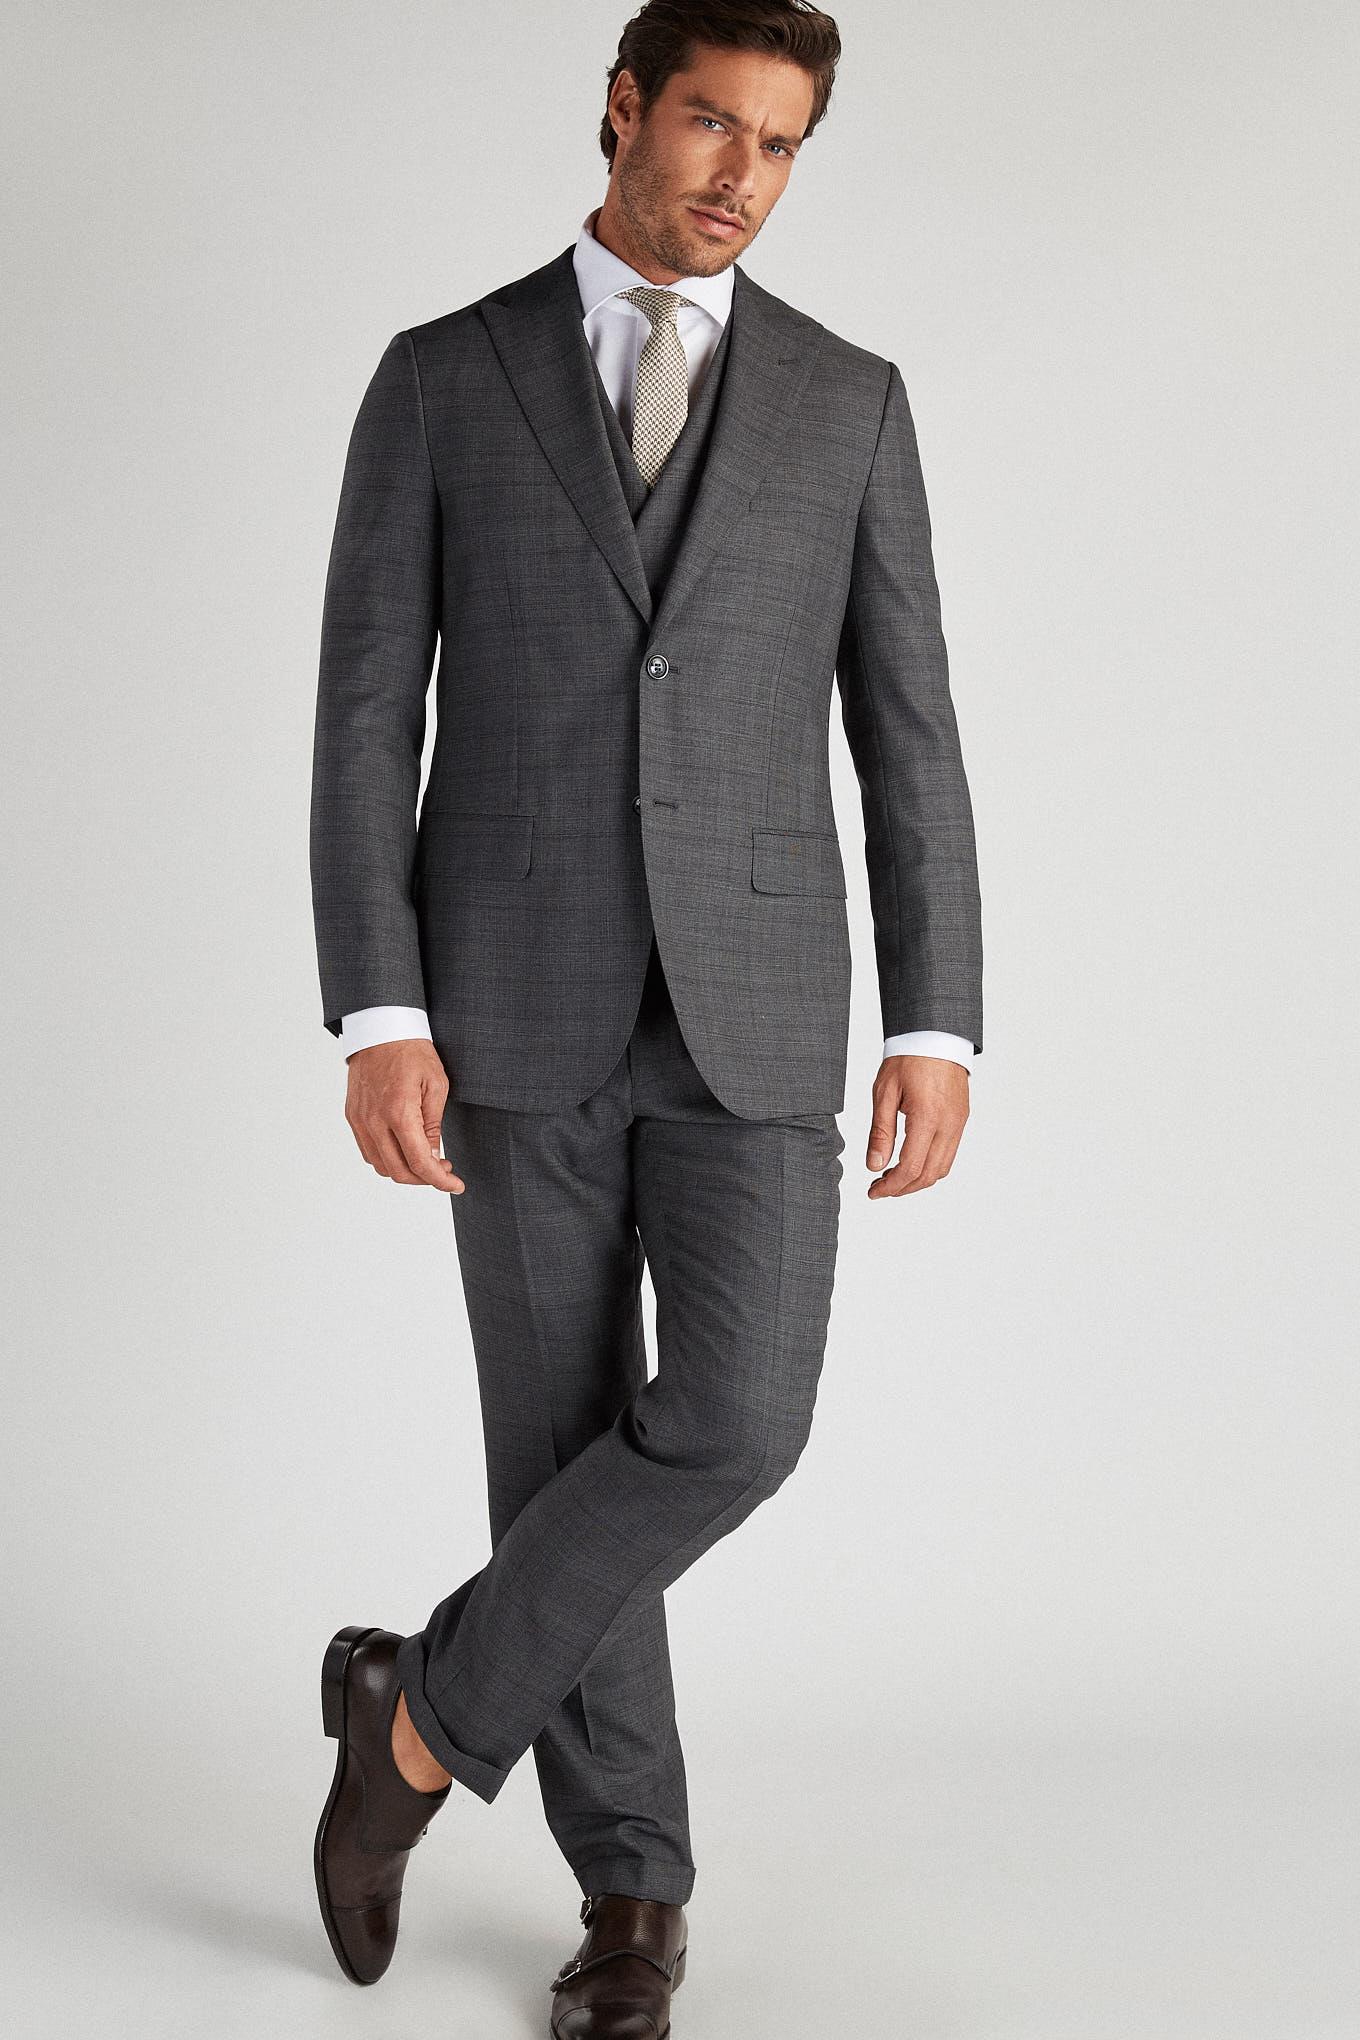 Suit with Vest Dark Grey Classic Man